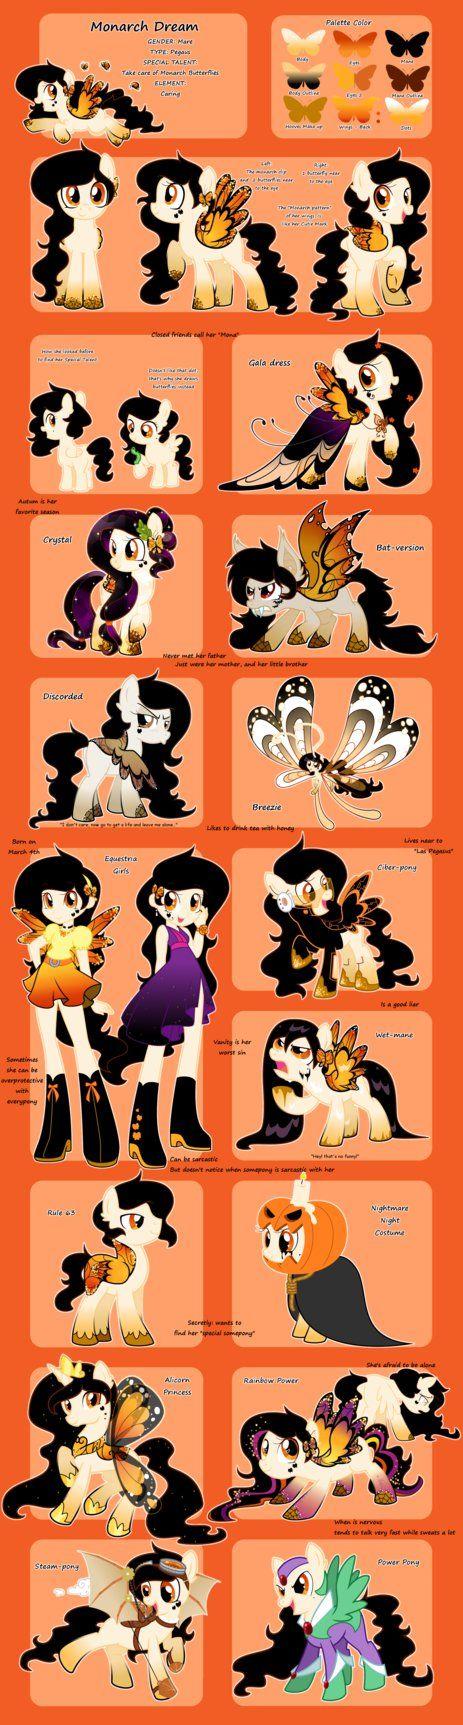 Monarch Dream Reference by YokoKinawa on DeviantArt